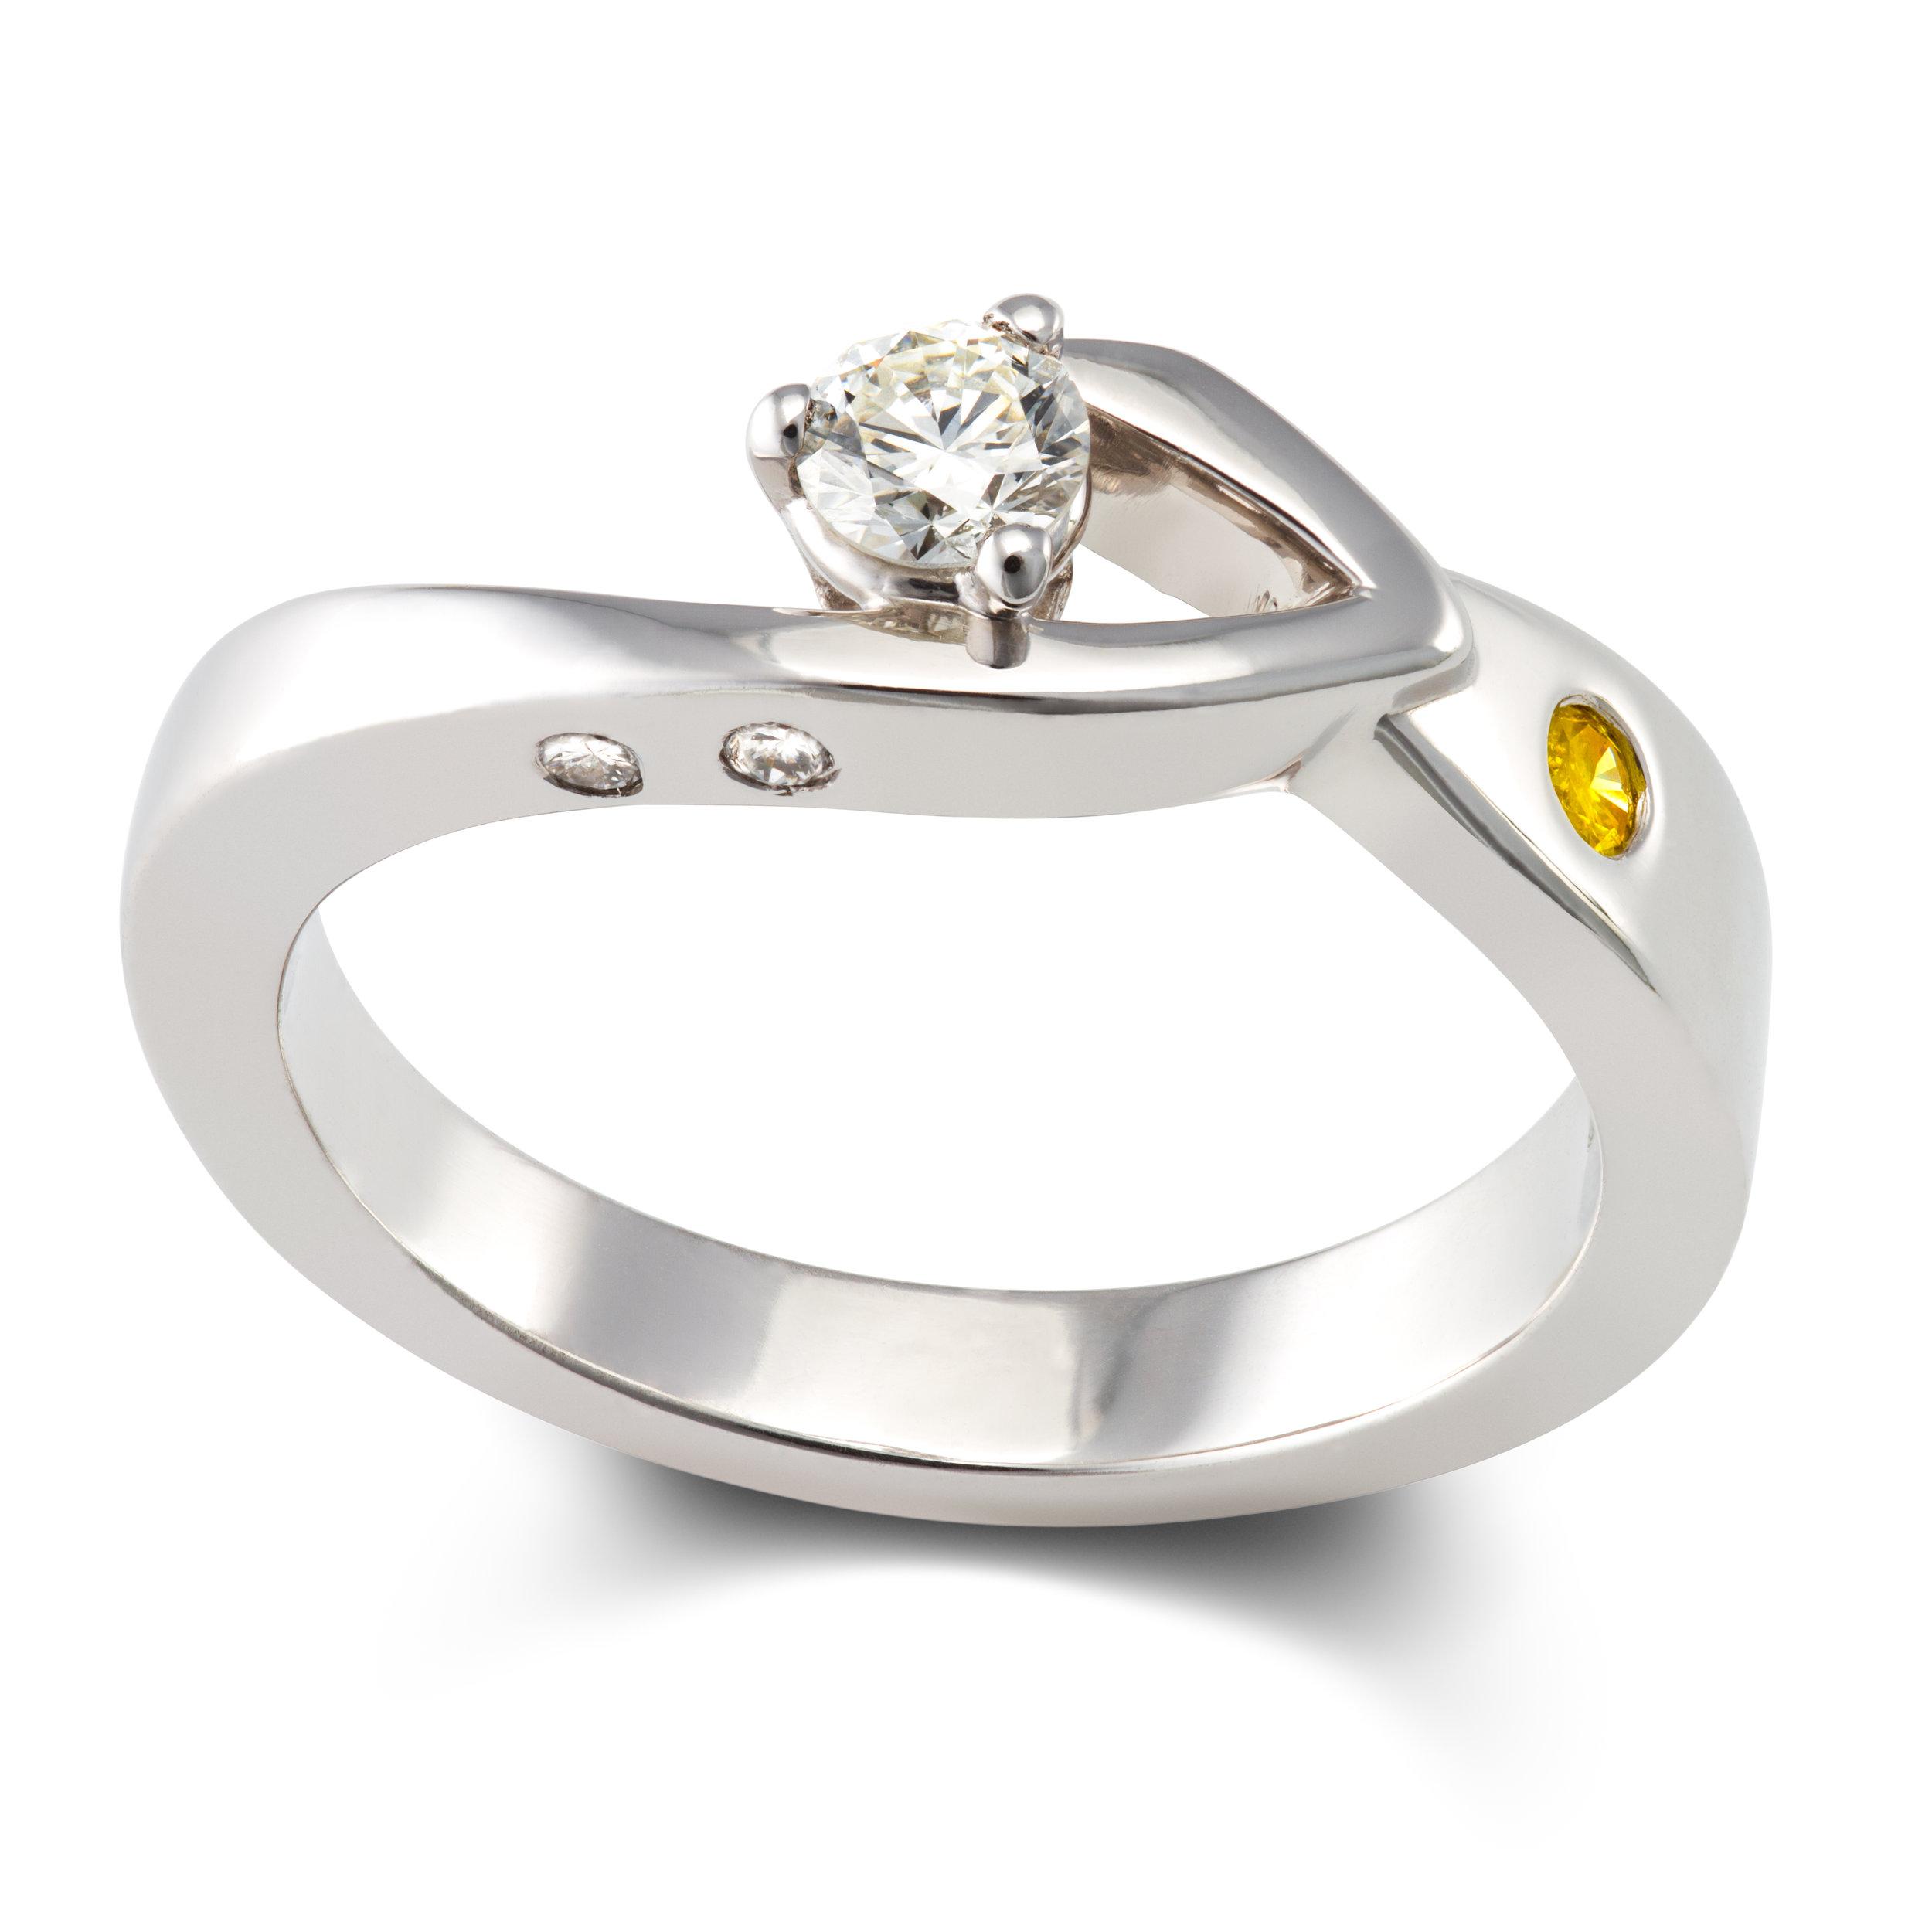 18ct white gold,diamond and natural yellow diamond engagement ring - £2,195